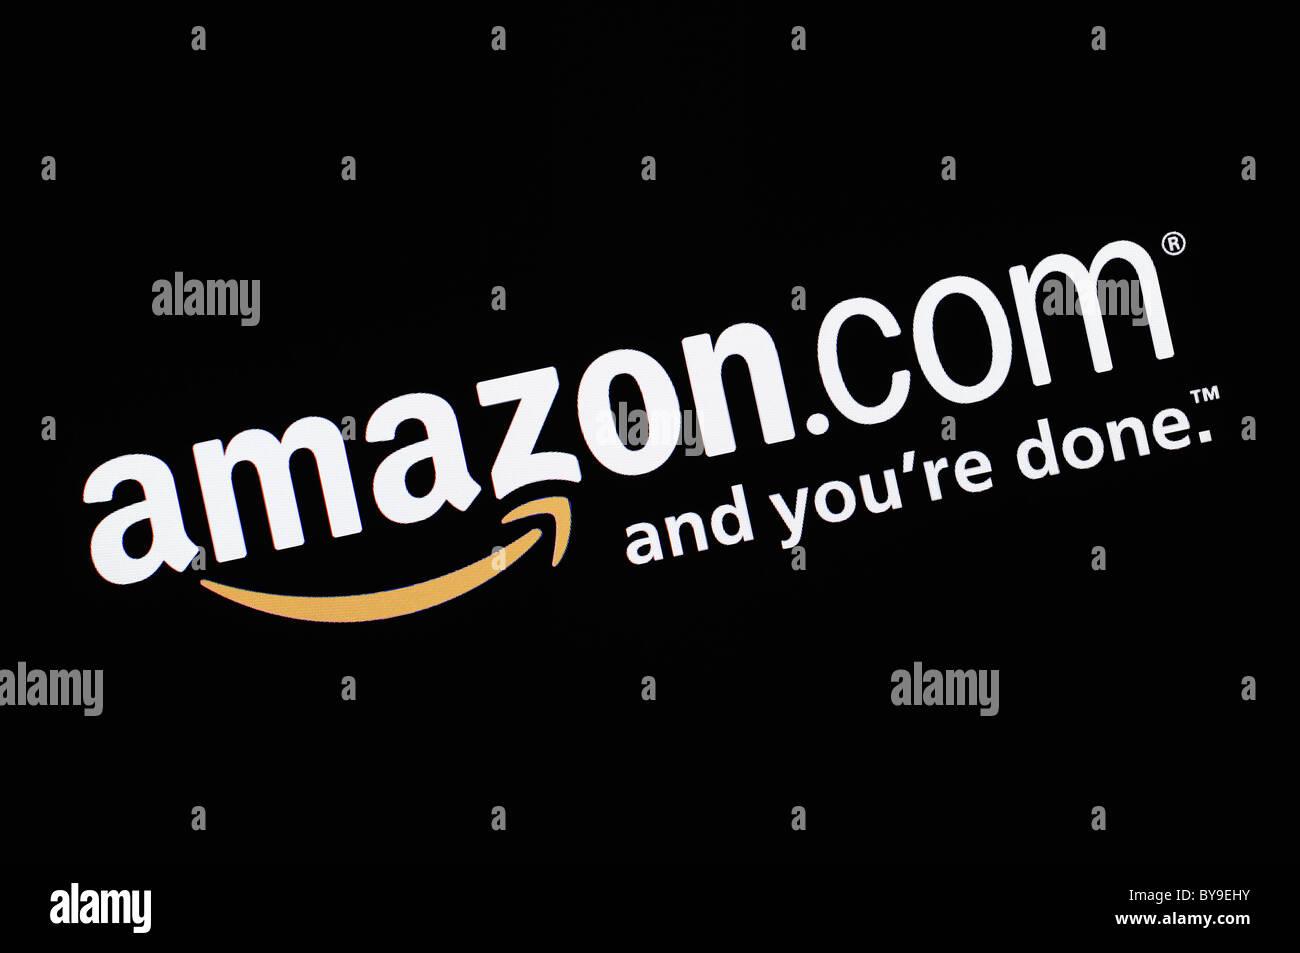 Amazon Screenshot Stock Photo